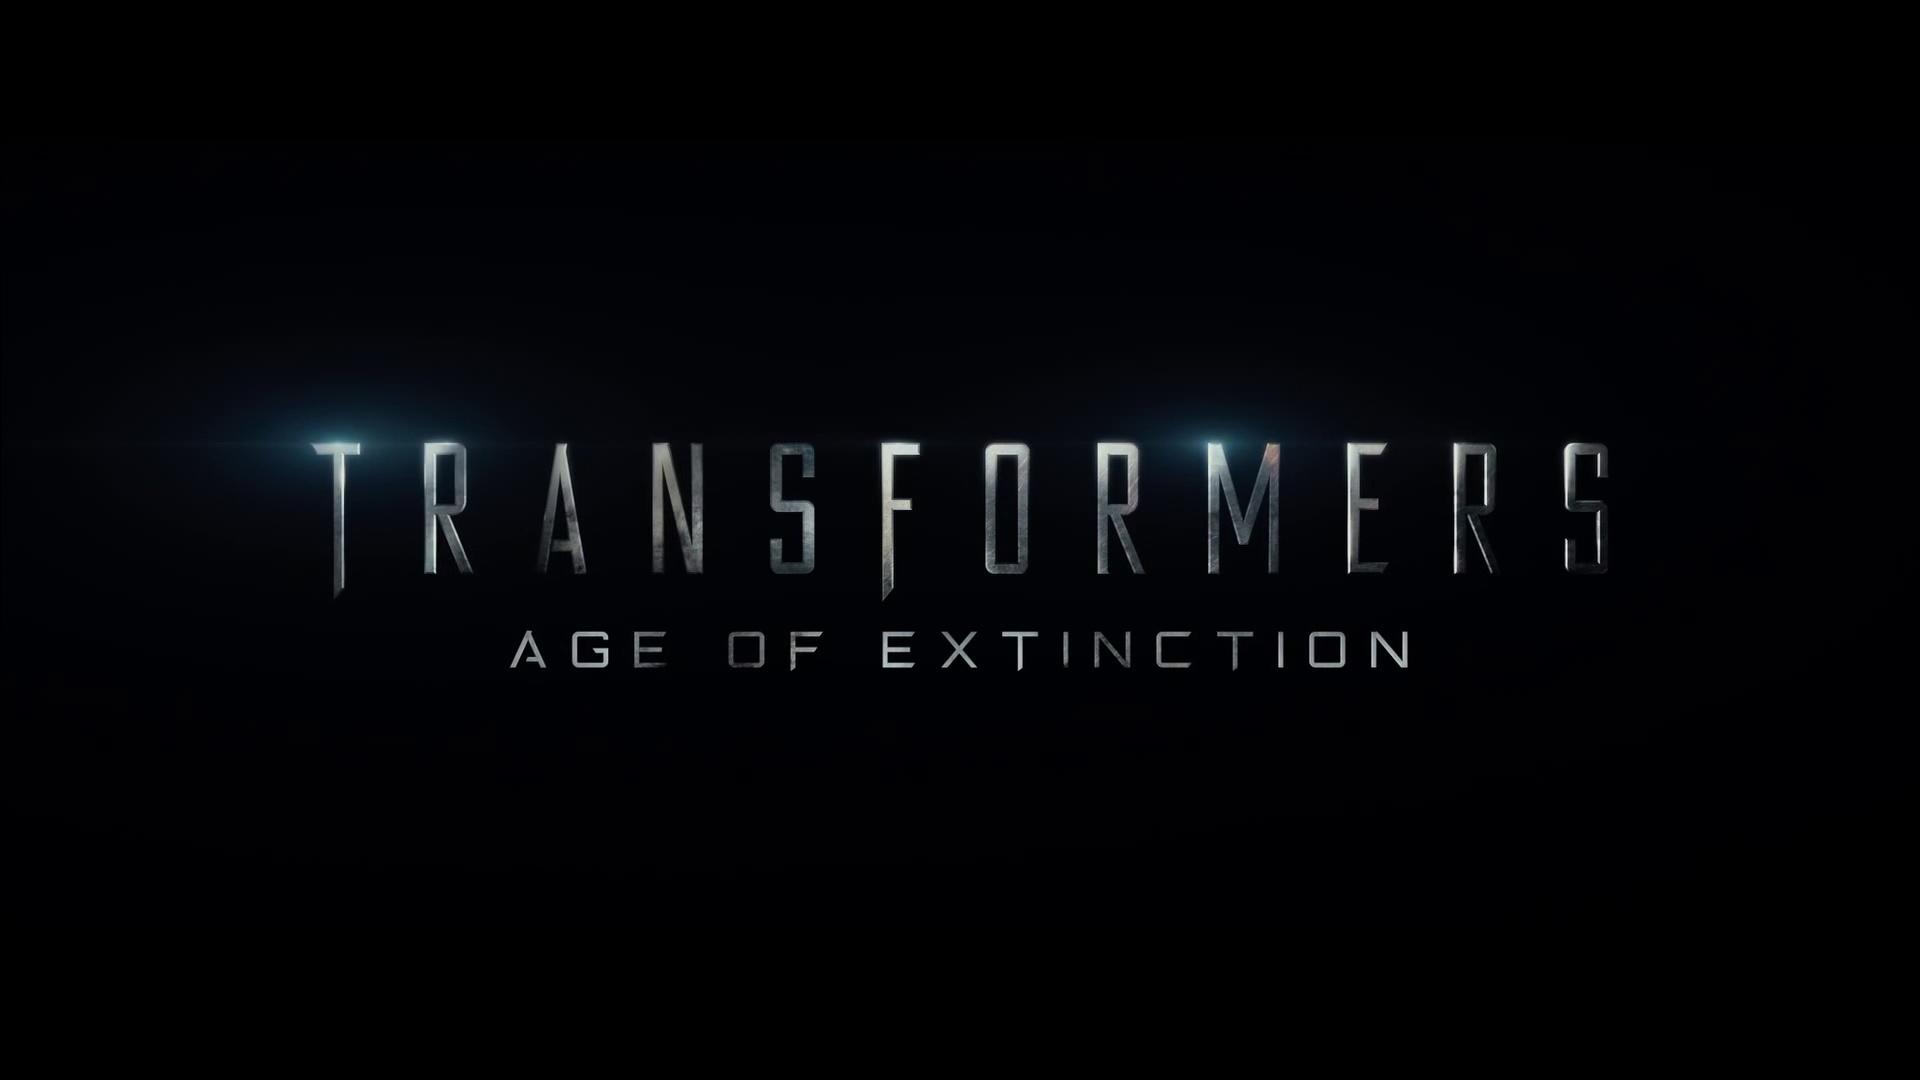 transformers age of extinction 2014 5n wallpaper hd